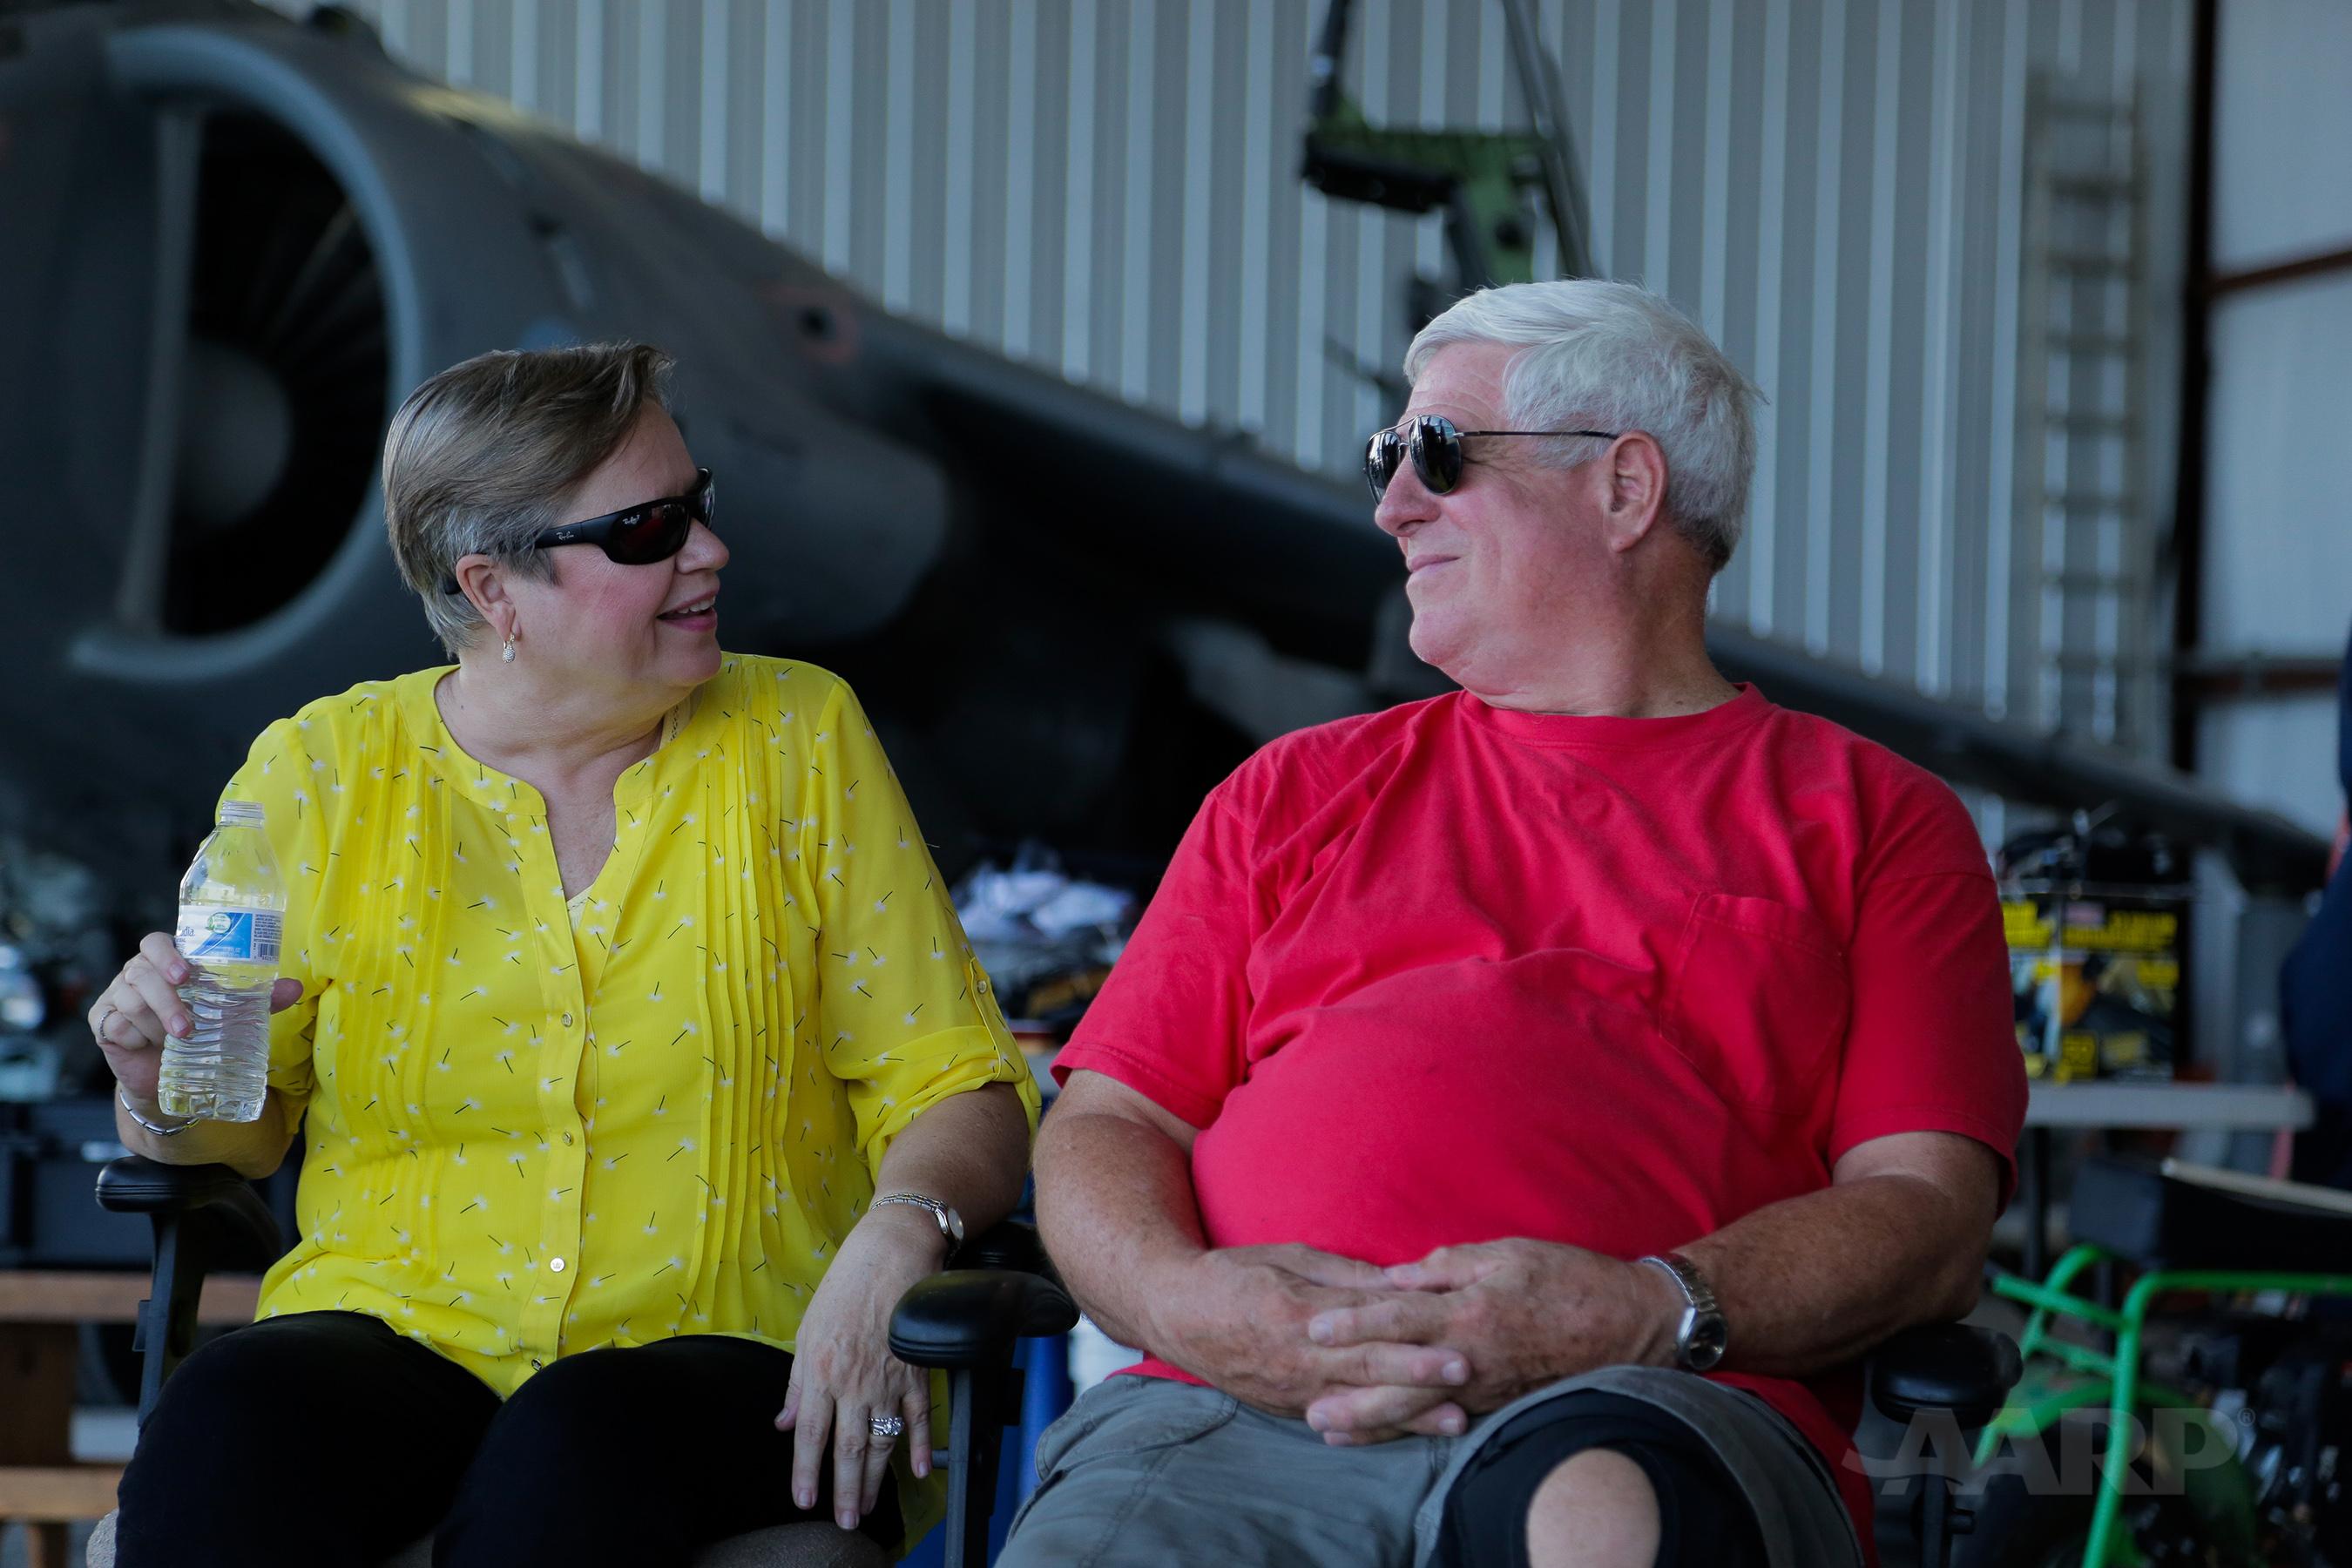 Art Nalls and his wife Pat Hatfield-Nalls. Photographer Credit: AARP Studios.